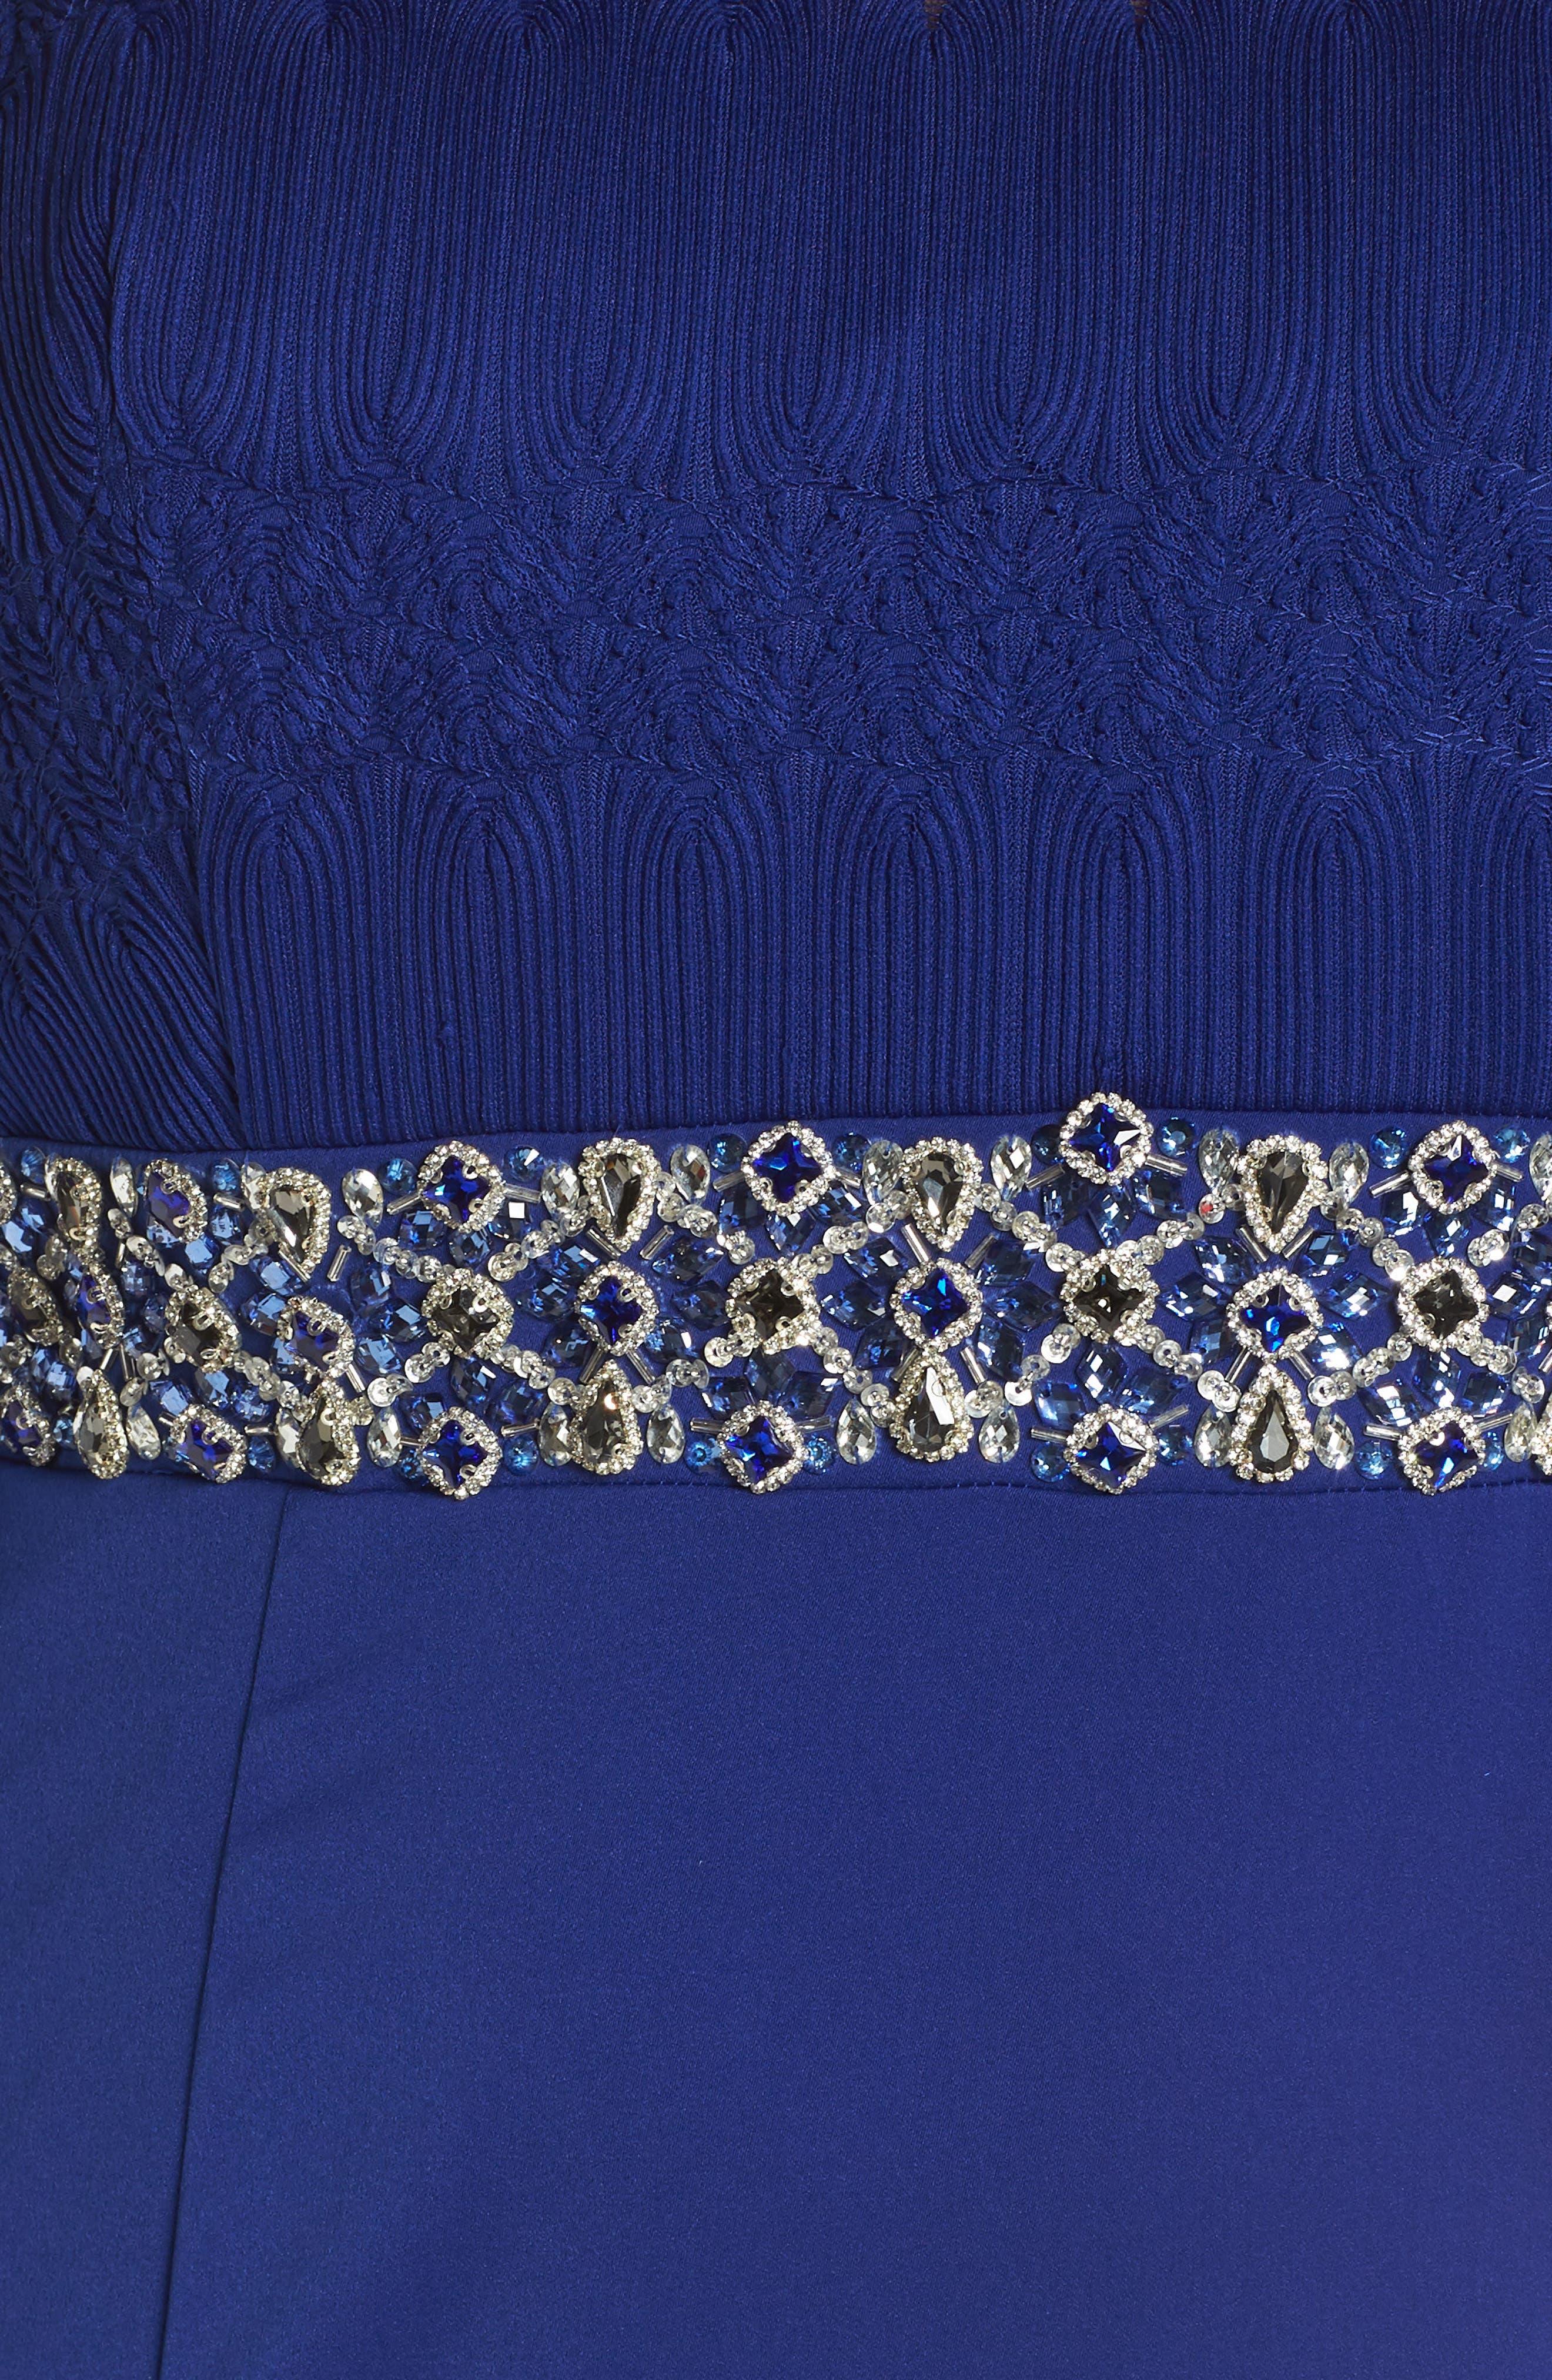 Embellished Gown,                             Alternate thumbnail 5, color,                             Royal